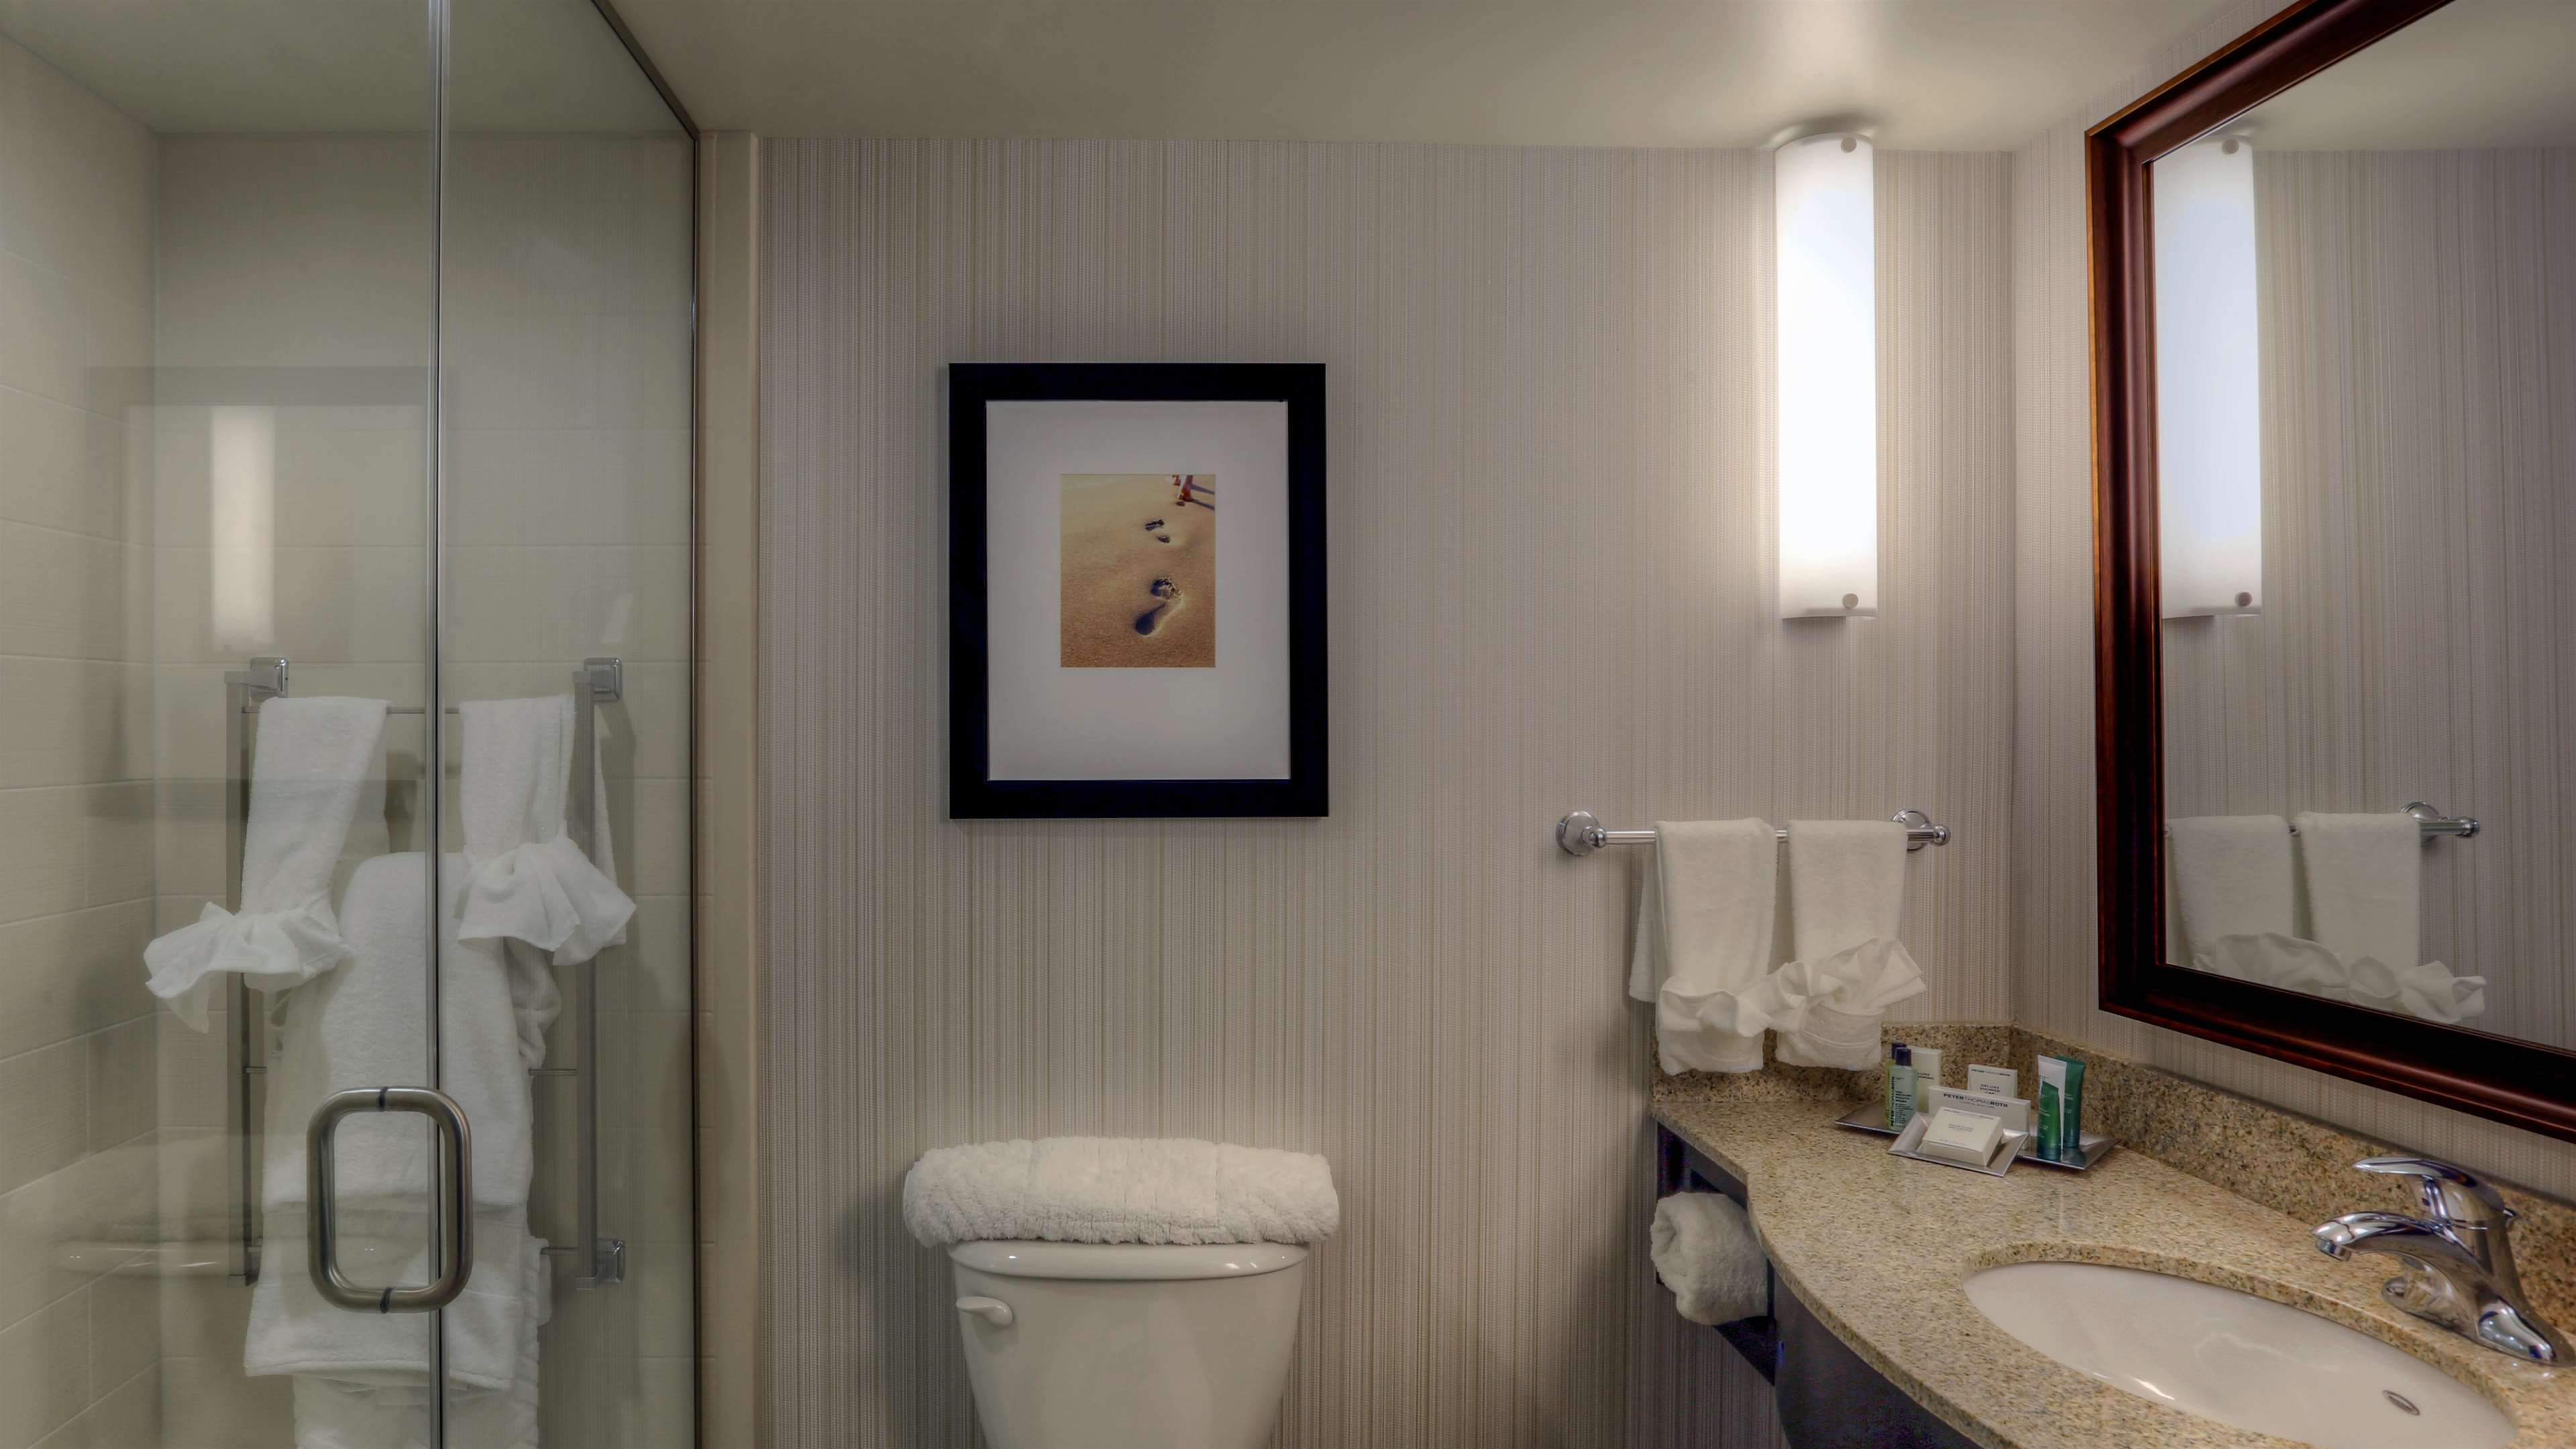 Hilton Garden Inn Virginia Beach Oceanfront image 30